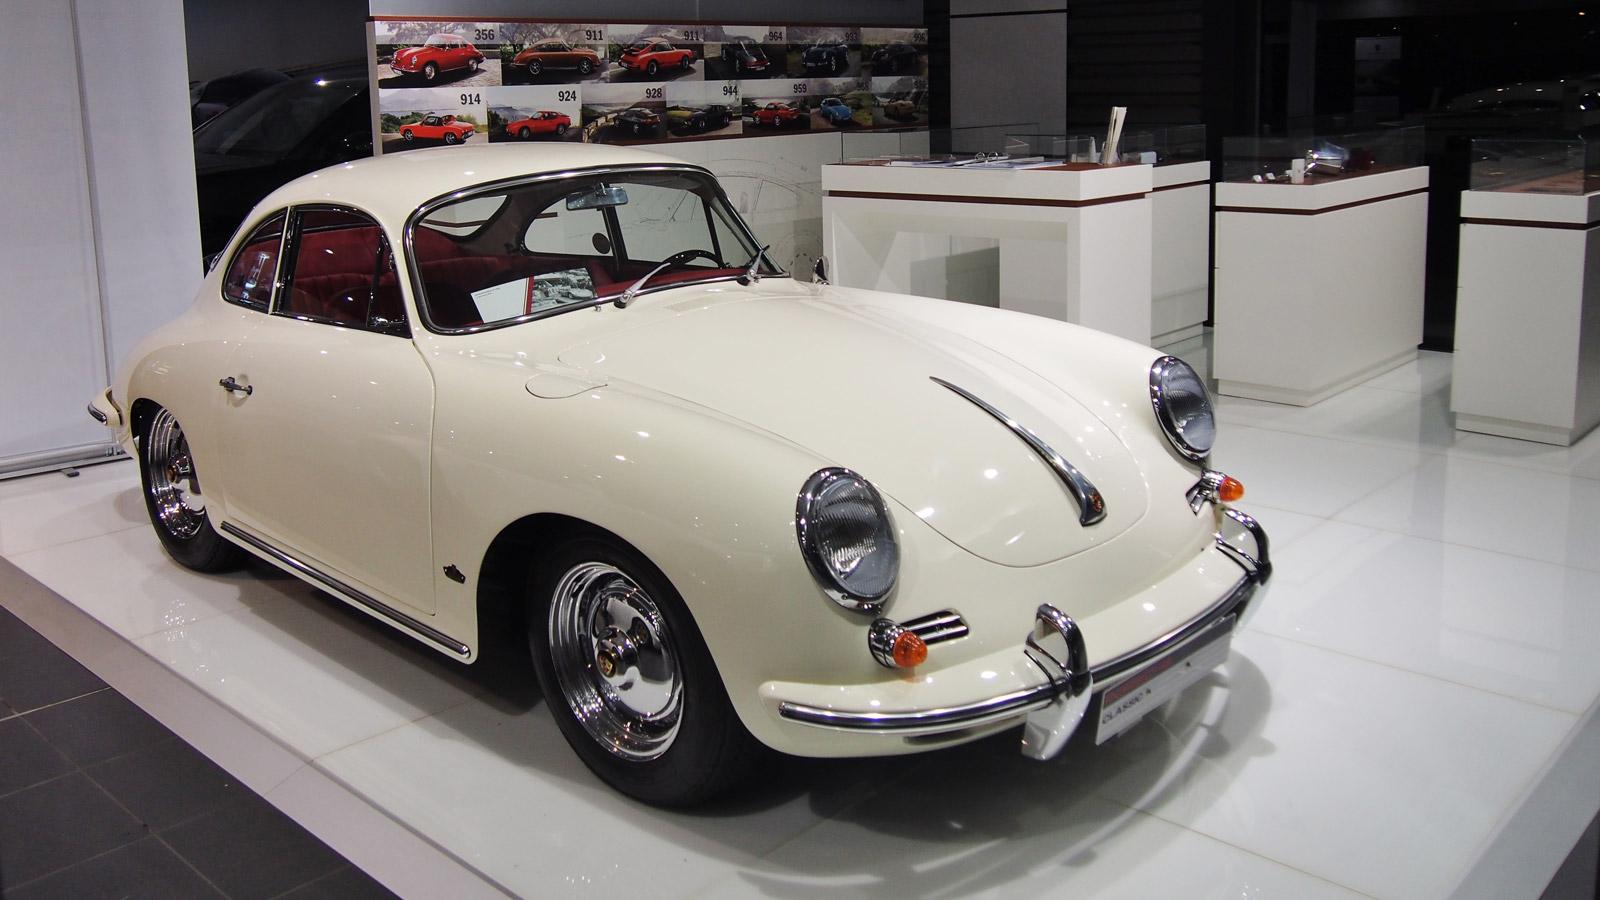 Porsche - Порше Центр Лорьян